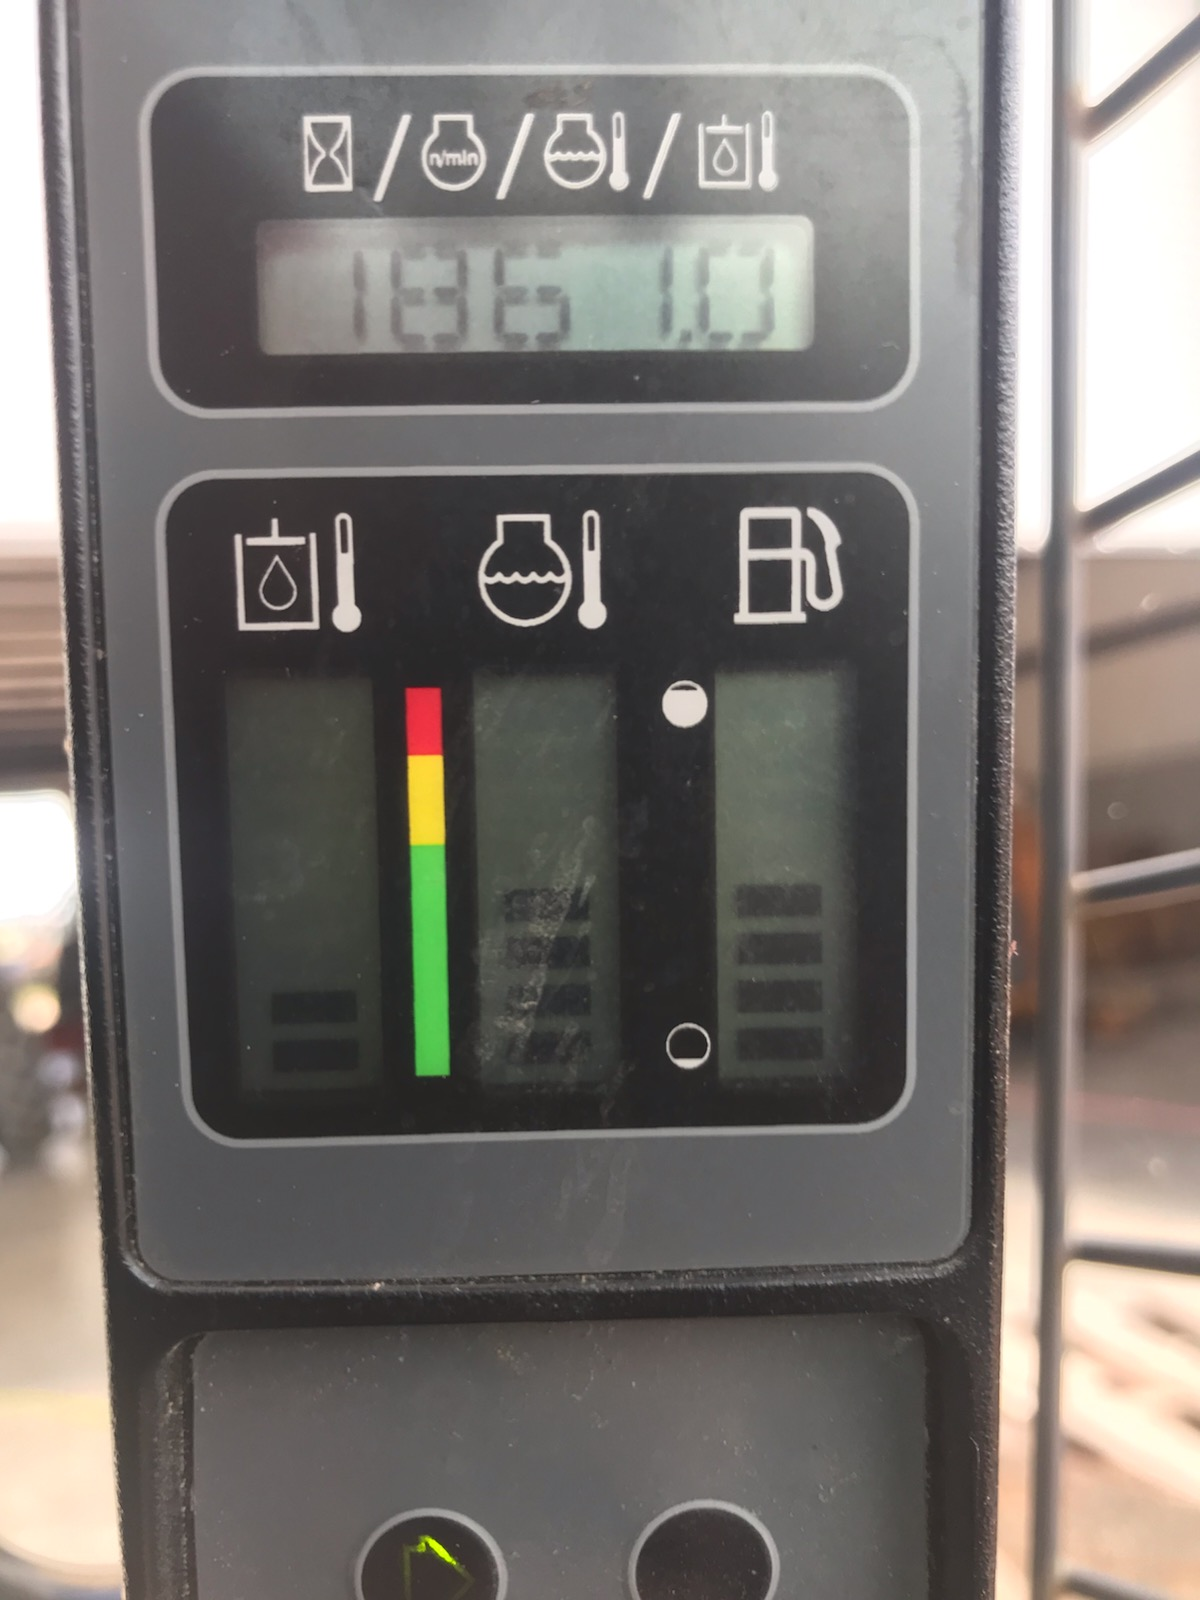 A Close Up Of A Parking Meter